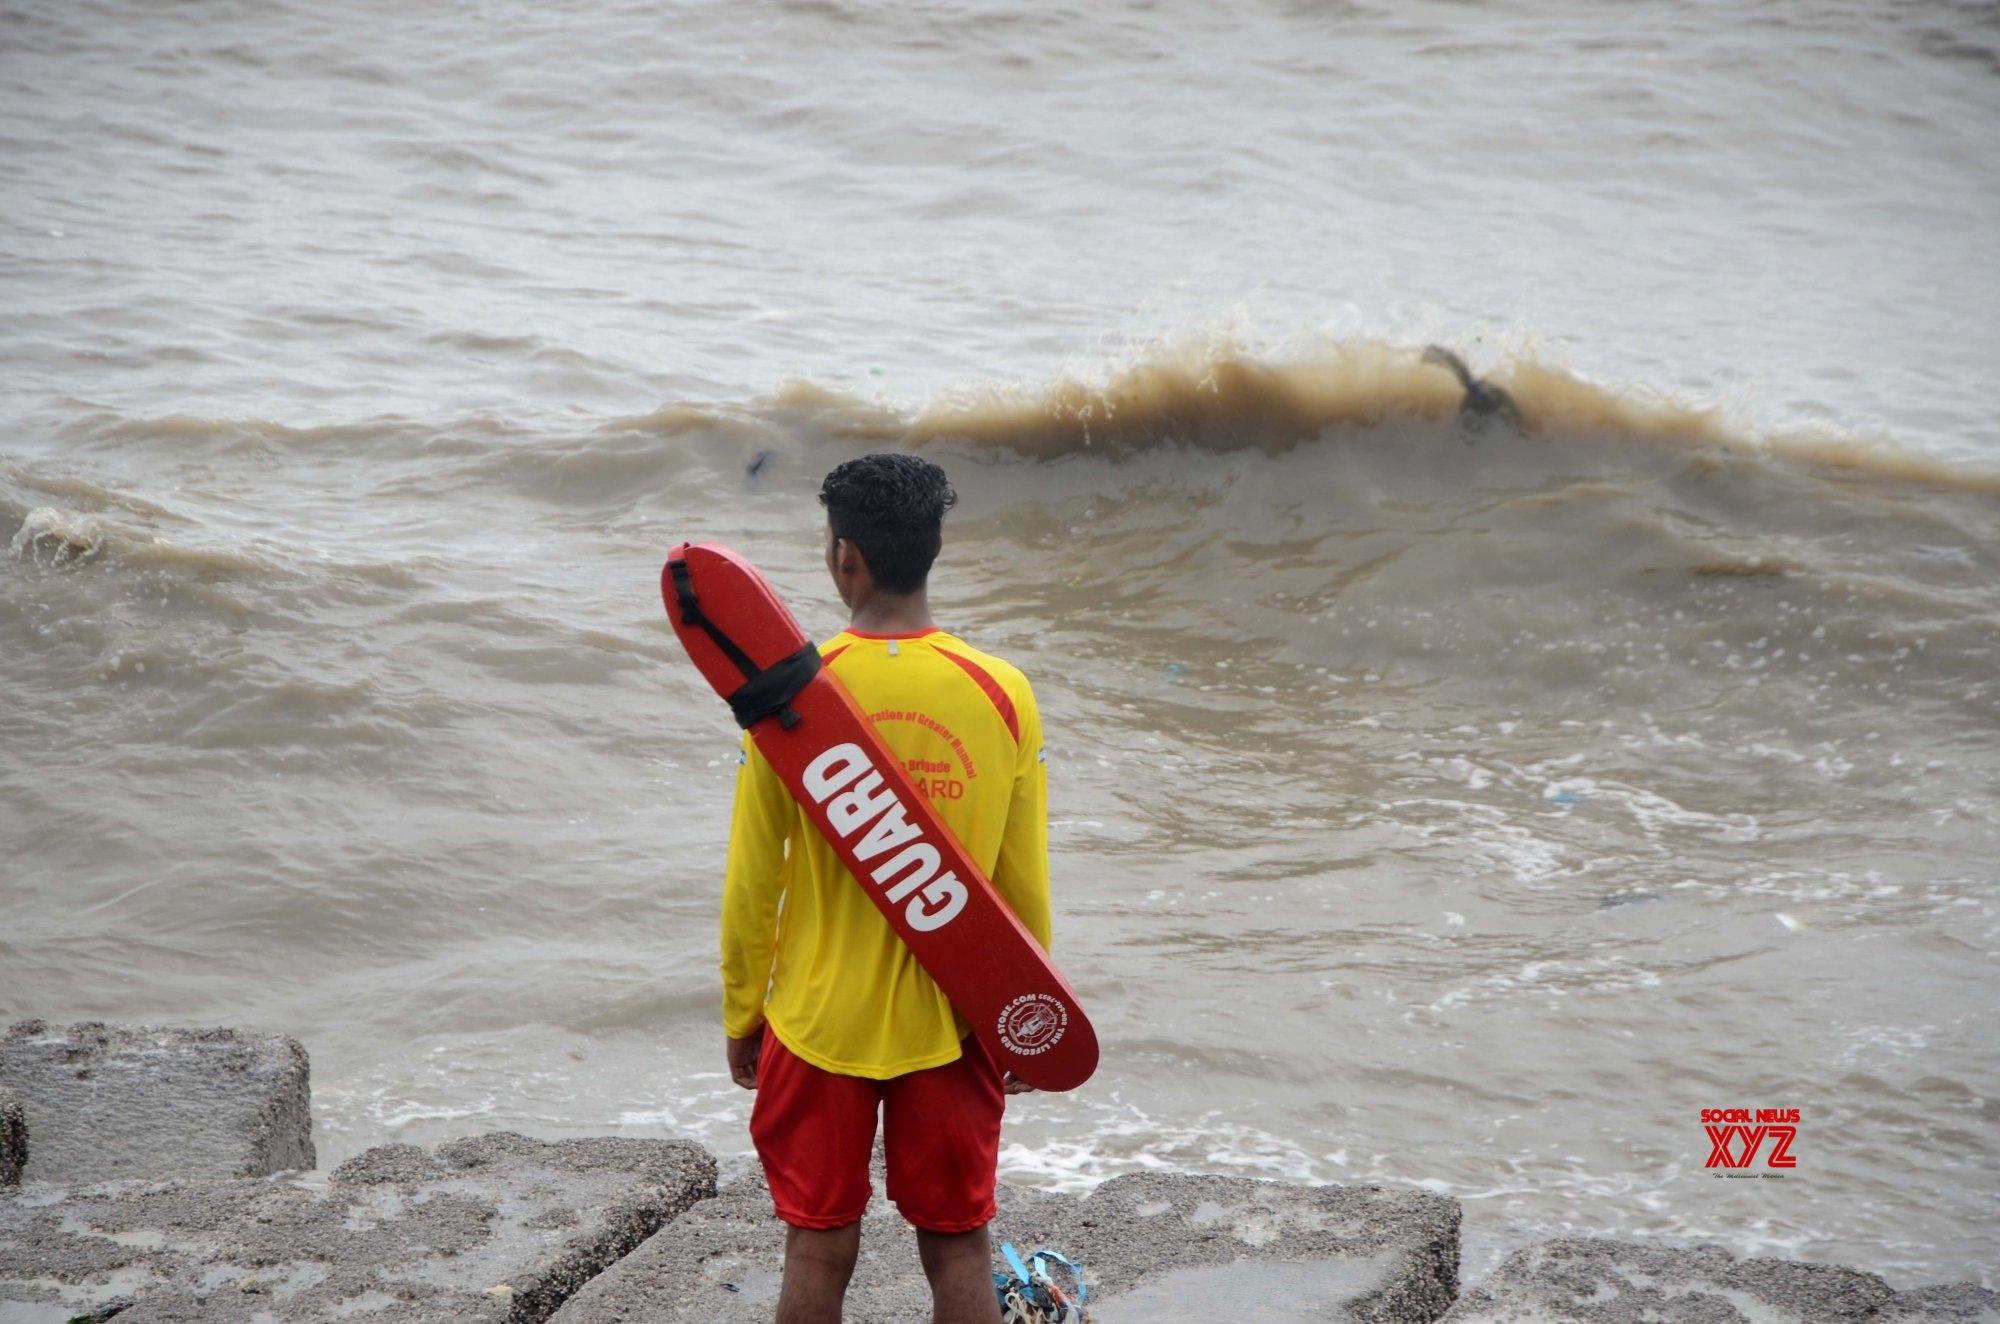 Mumbai: Cyclone Vayu - Life guard on duty #Gallery